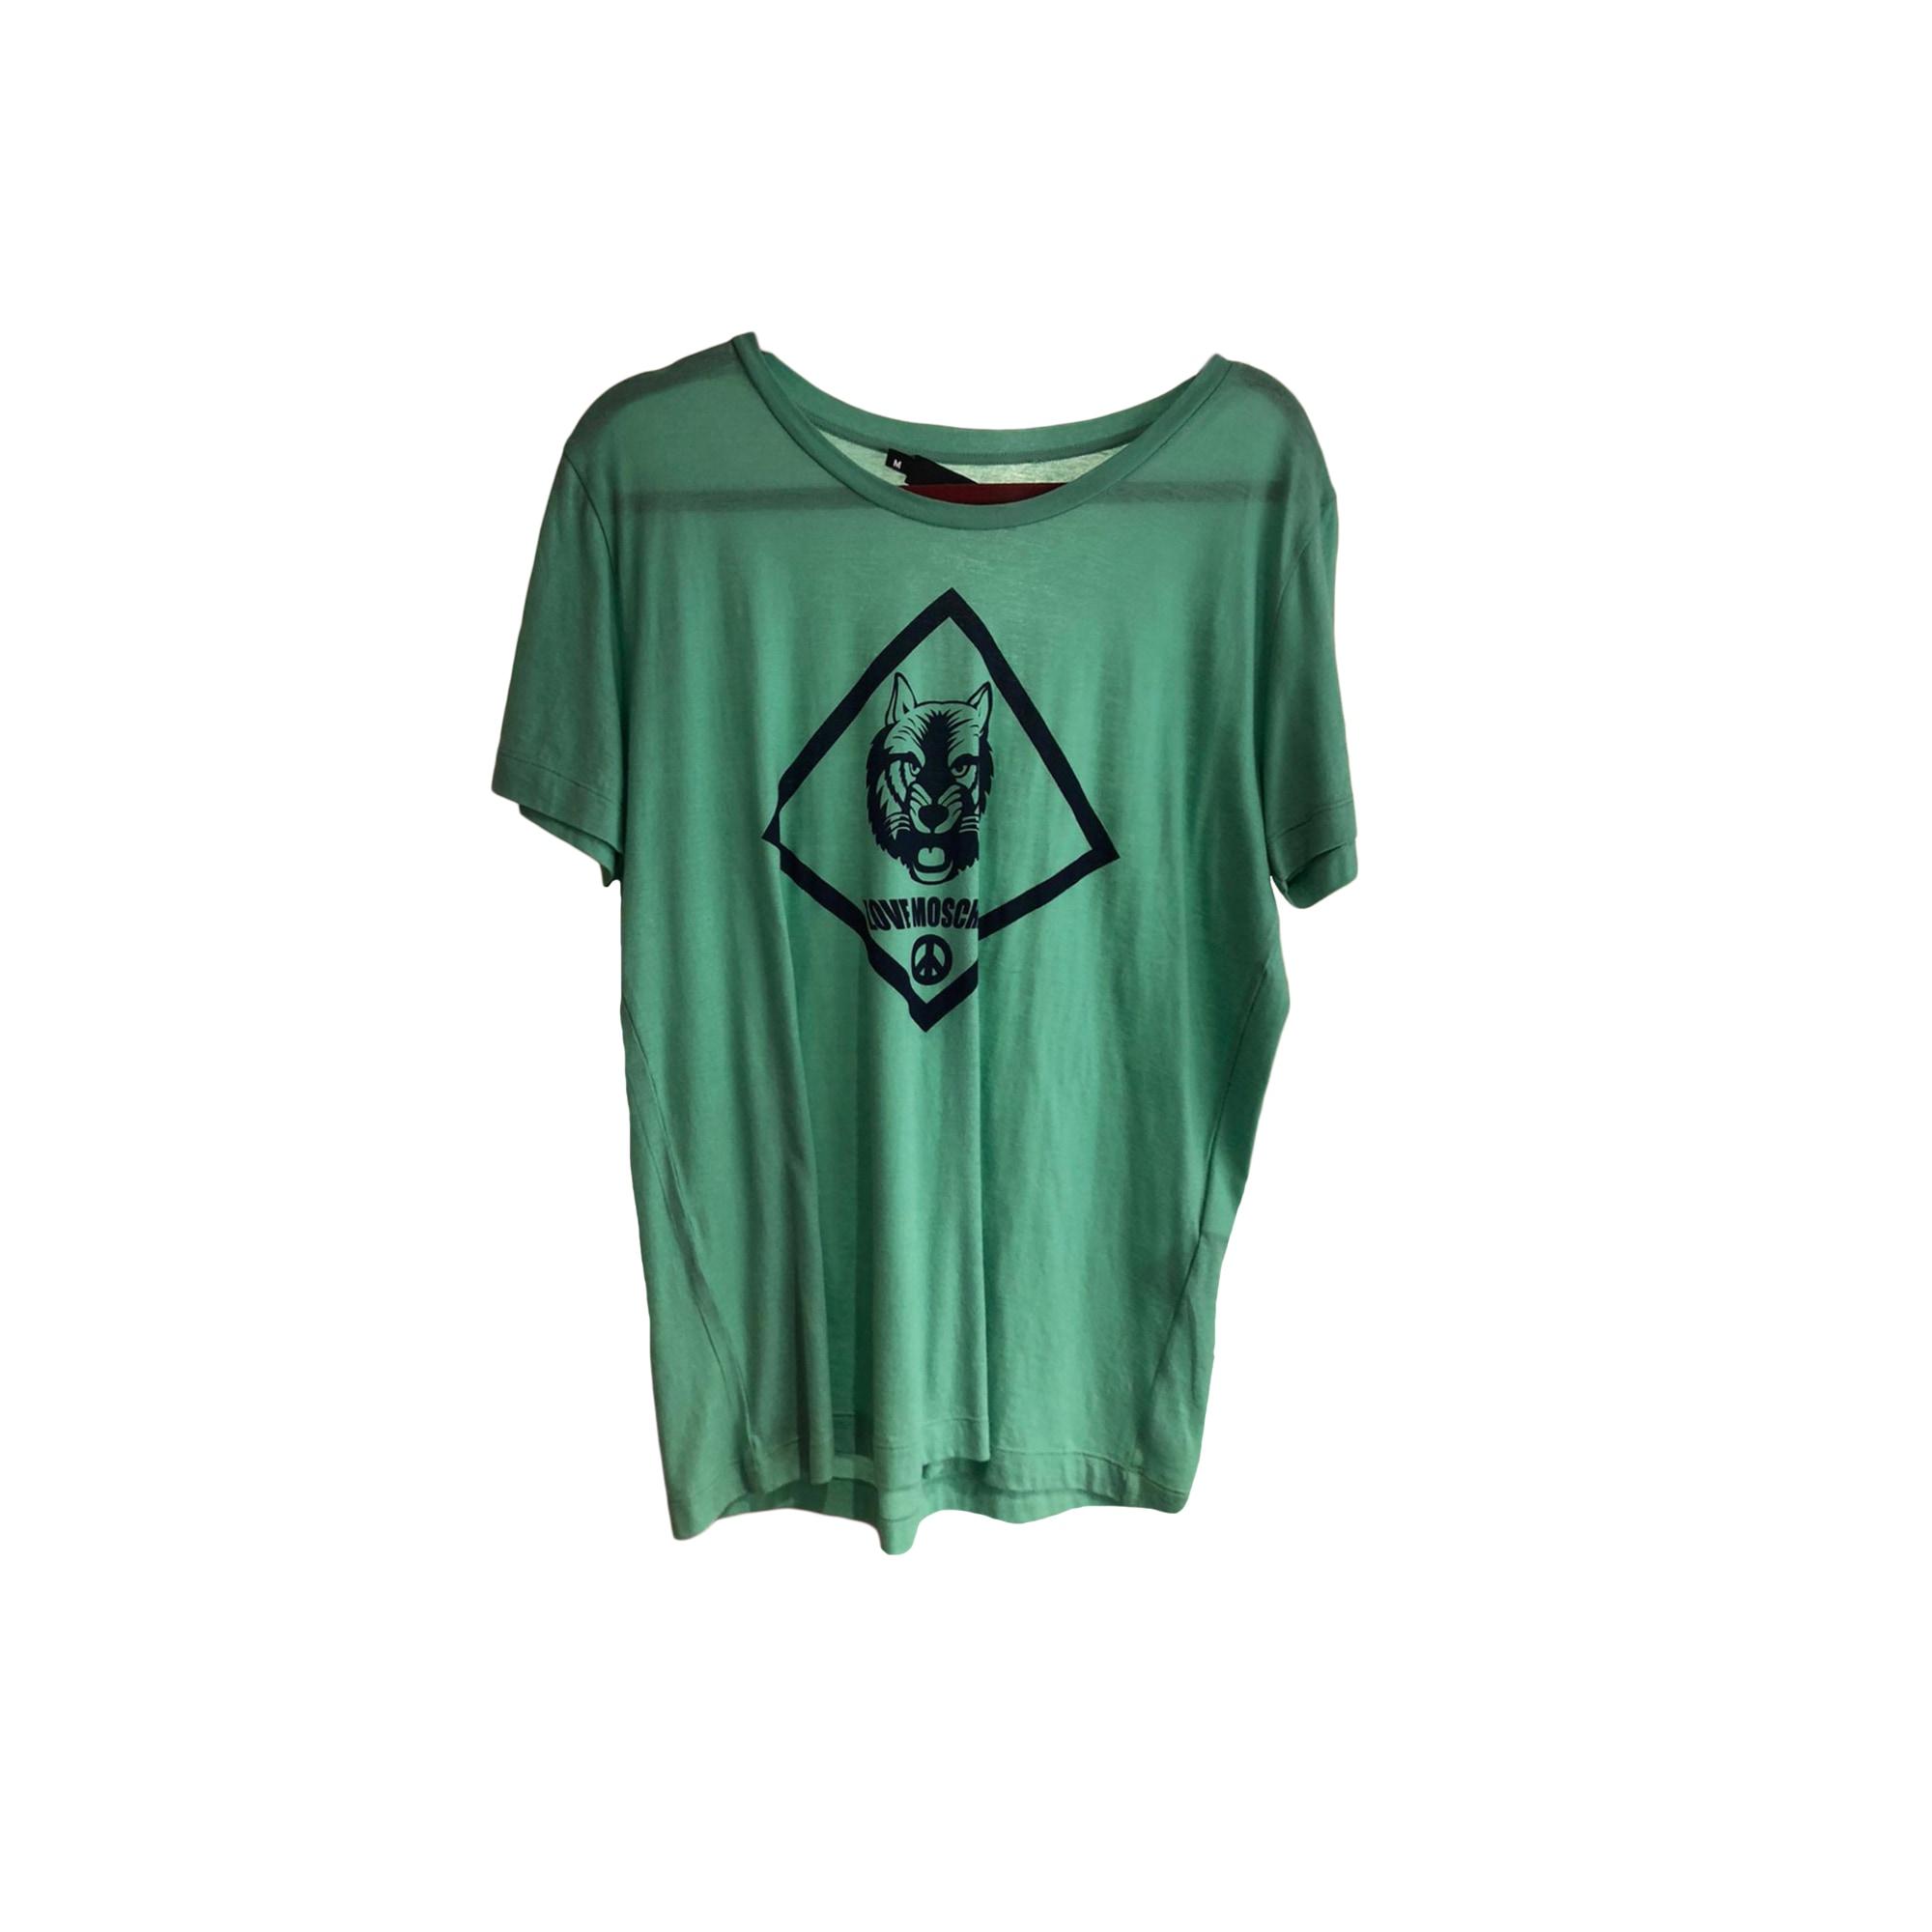 Tee-shirt LOVE MOSCHINO Violet, mauve, lavande